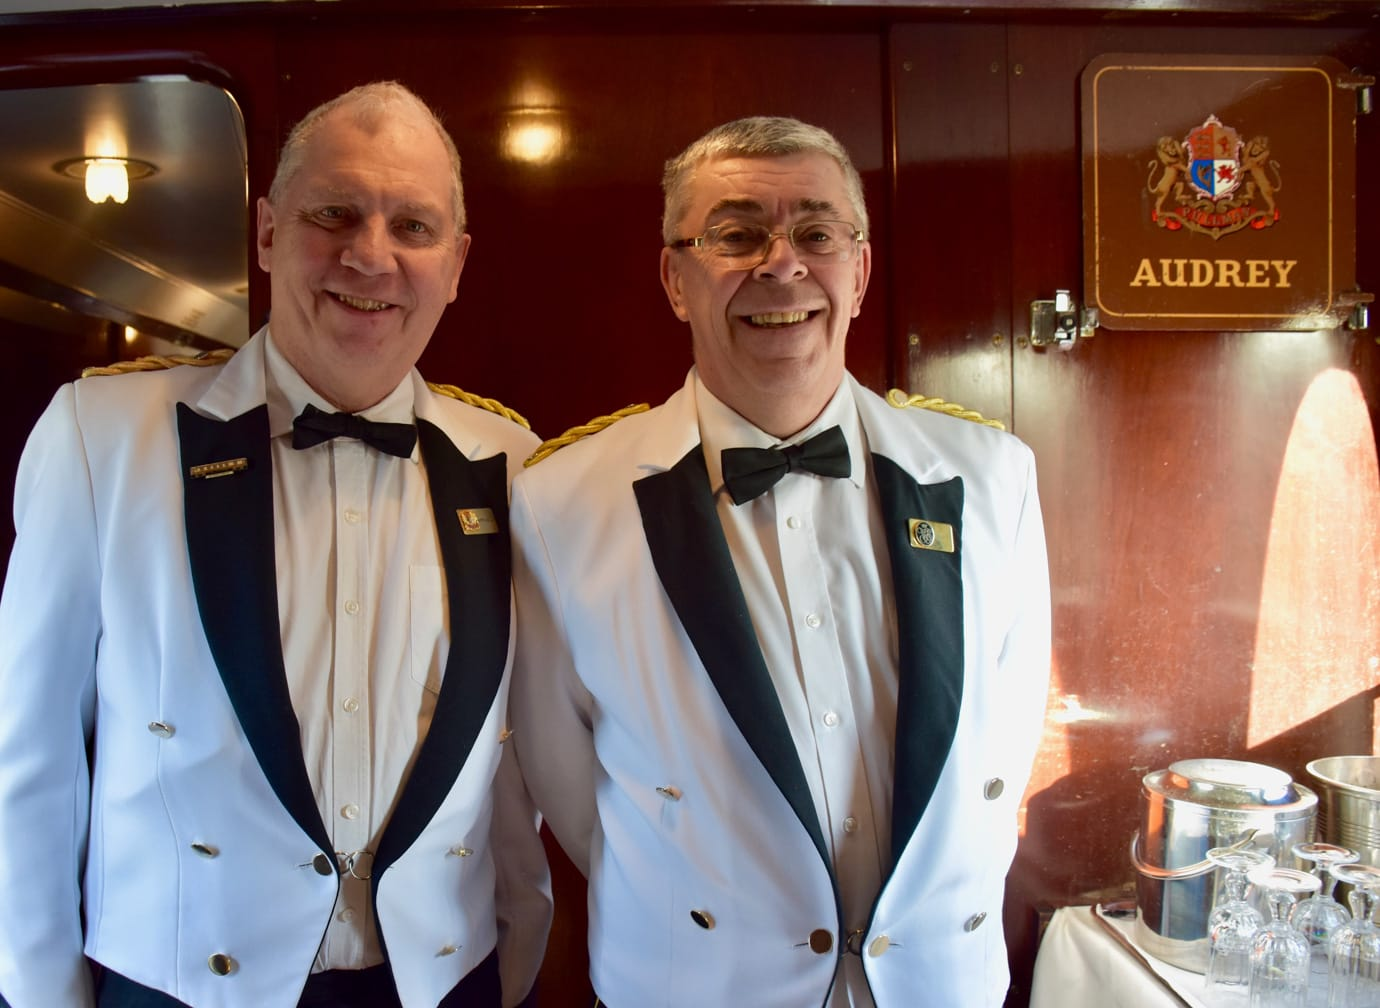 Two staff on the Belmond British Pullman train